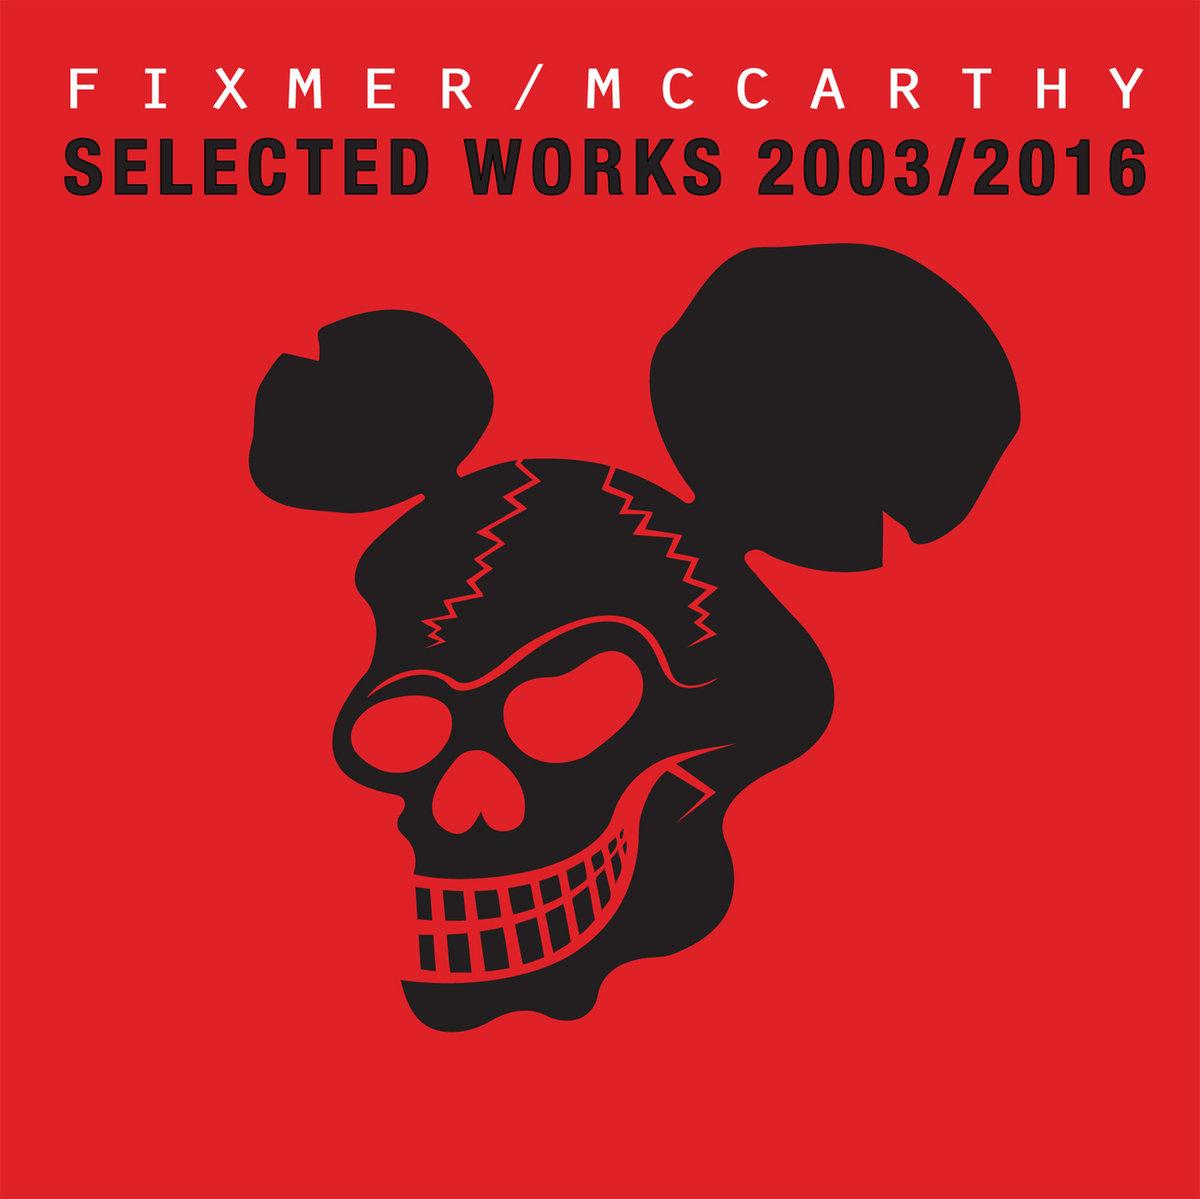 fixmer mccarthy